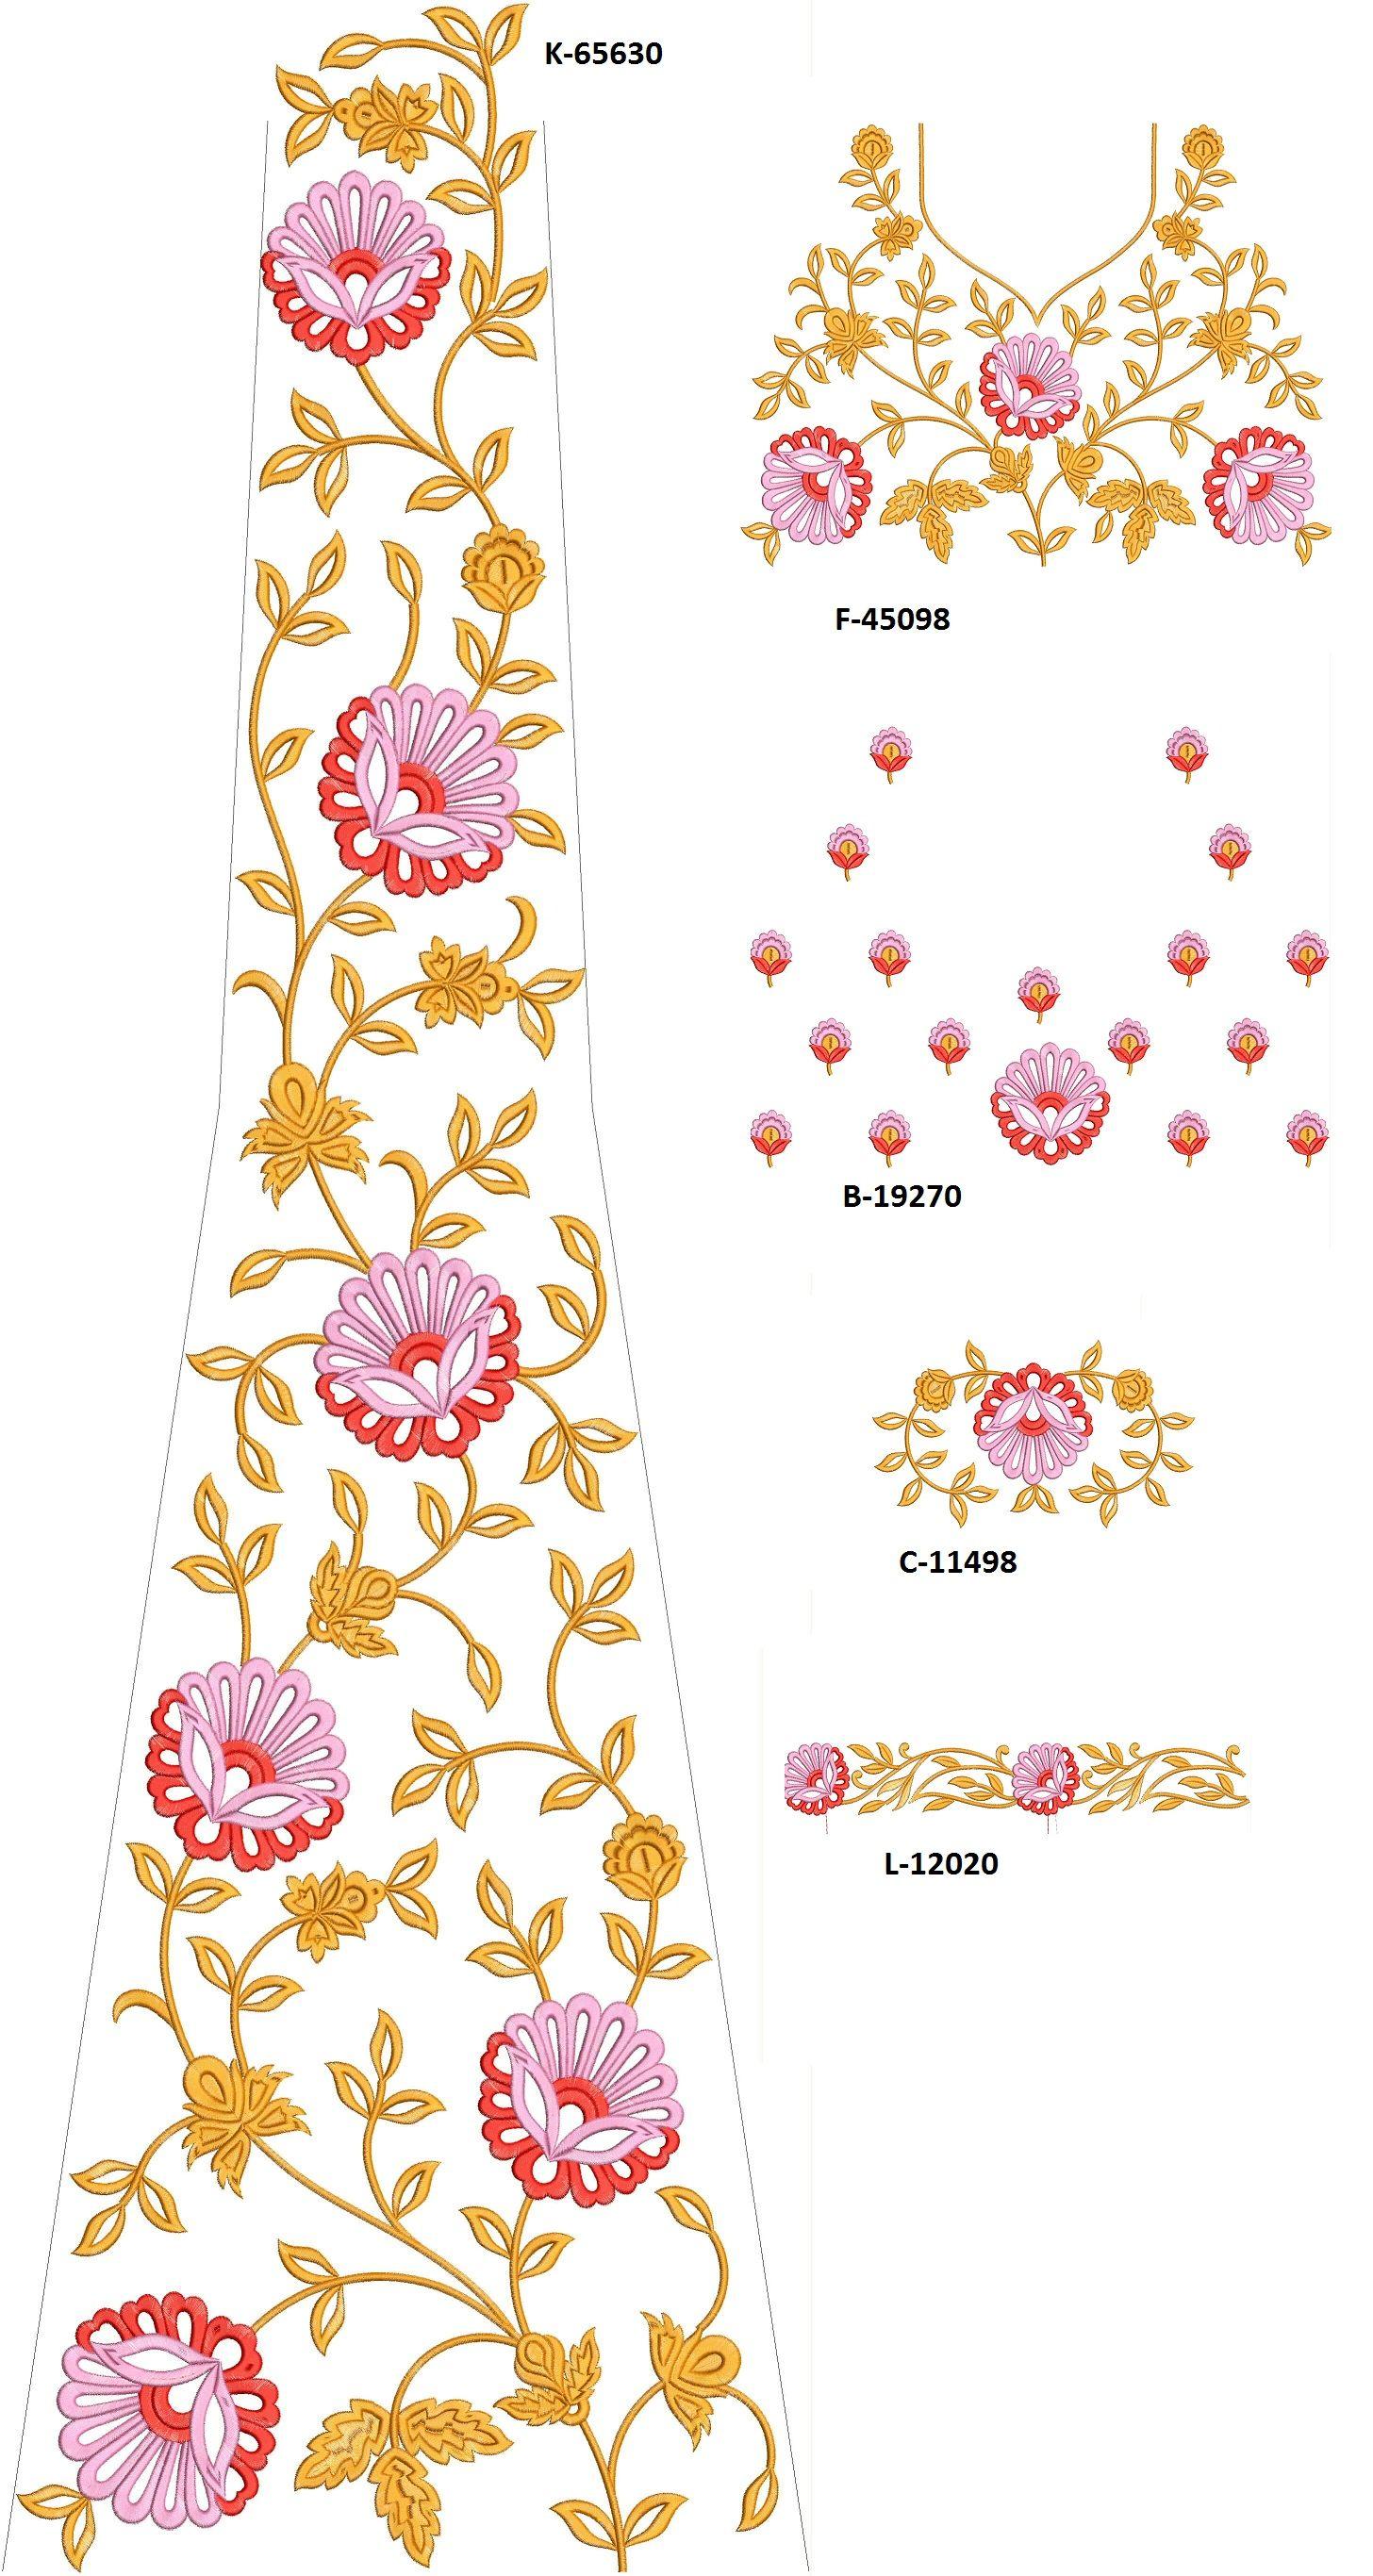 Latest Bridal Lehenga Design Lehenga Choli Designs Download Embroidery Design From Embcart Mobile Application Bridal Applique Fashion Sewing Lehnga Designs